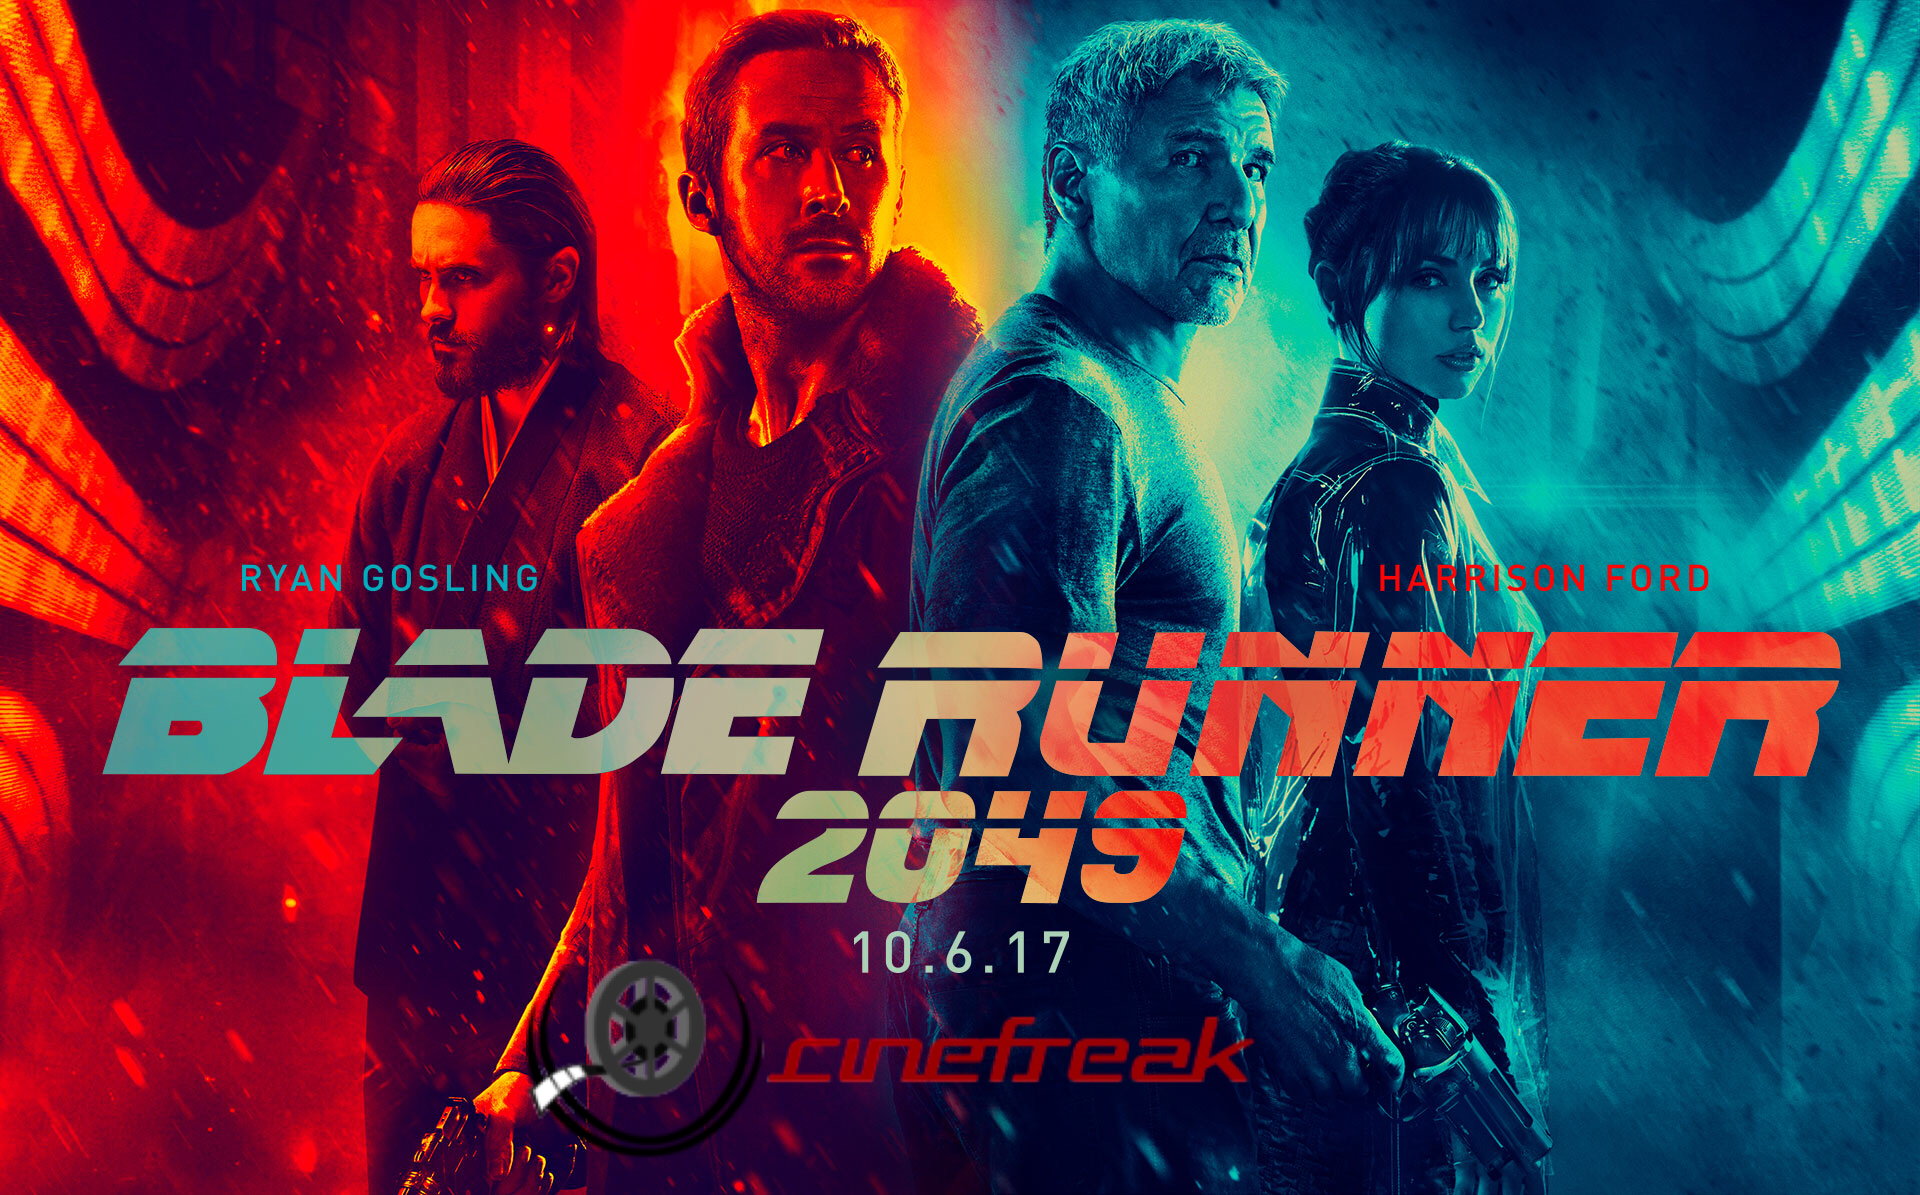 Blade Runner 2049 estreia no Brasil 3